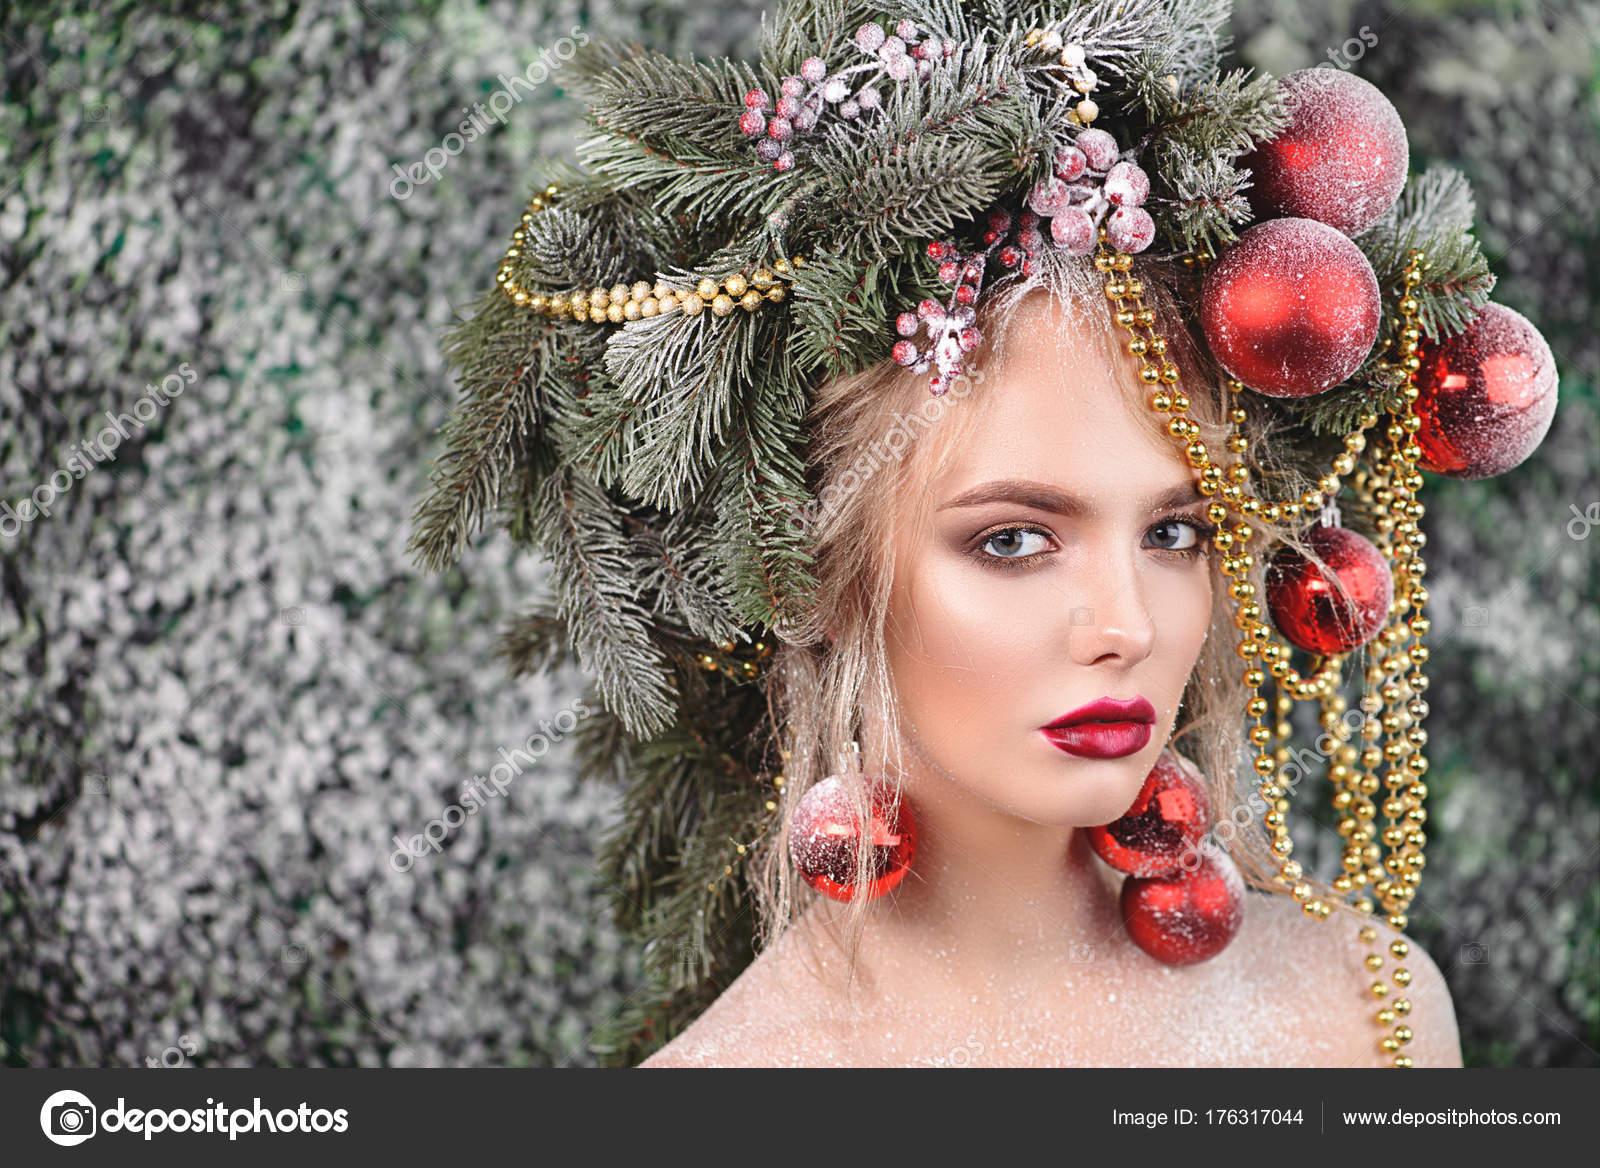 Xmas Tree In Hairstyle Stock Photo C Prometeus 176317044